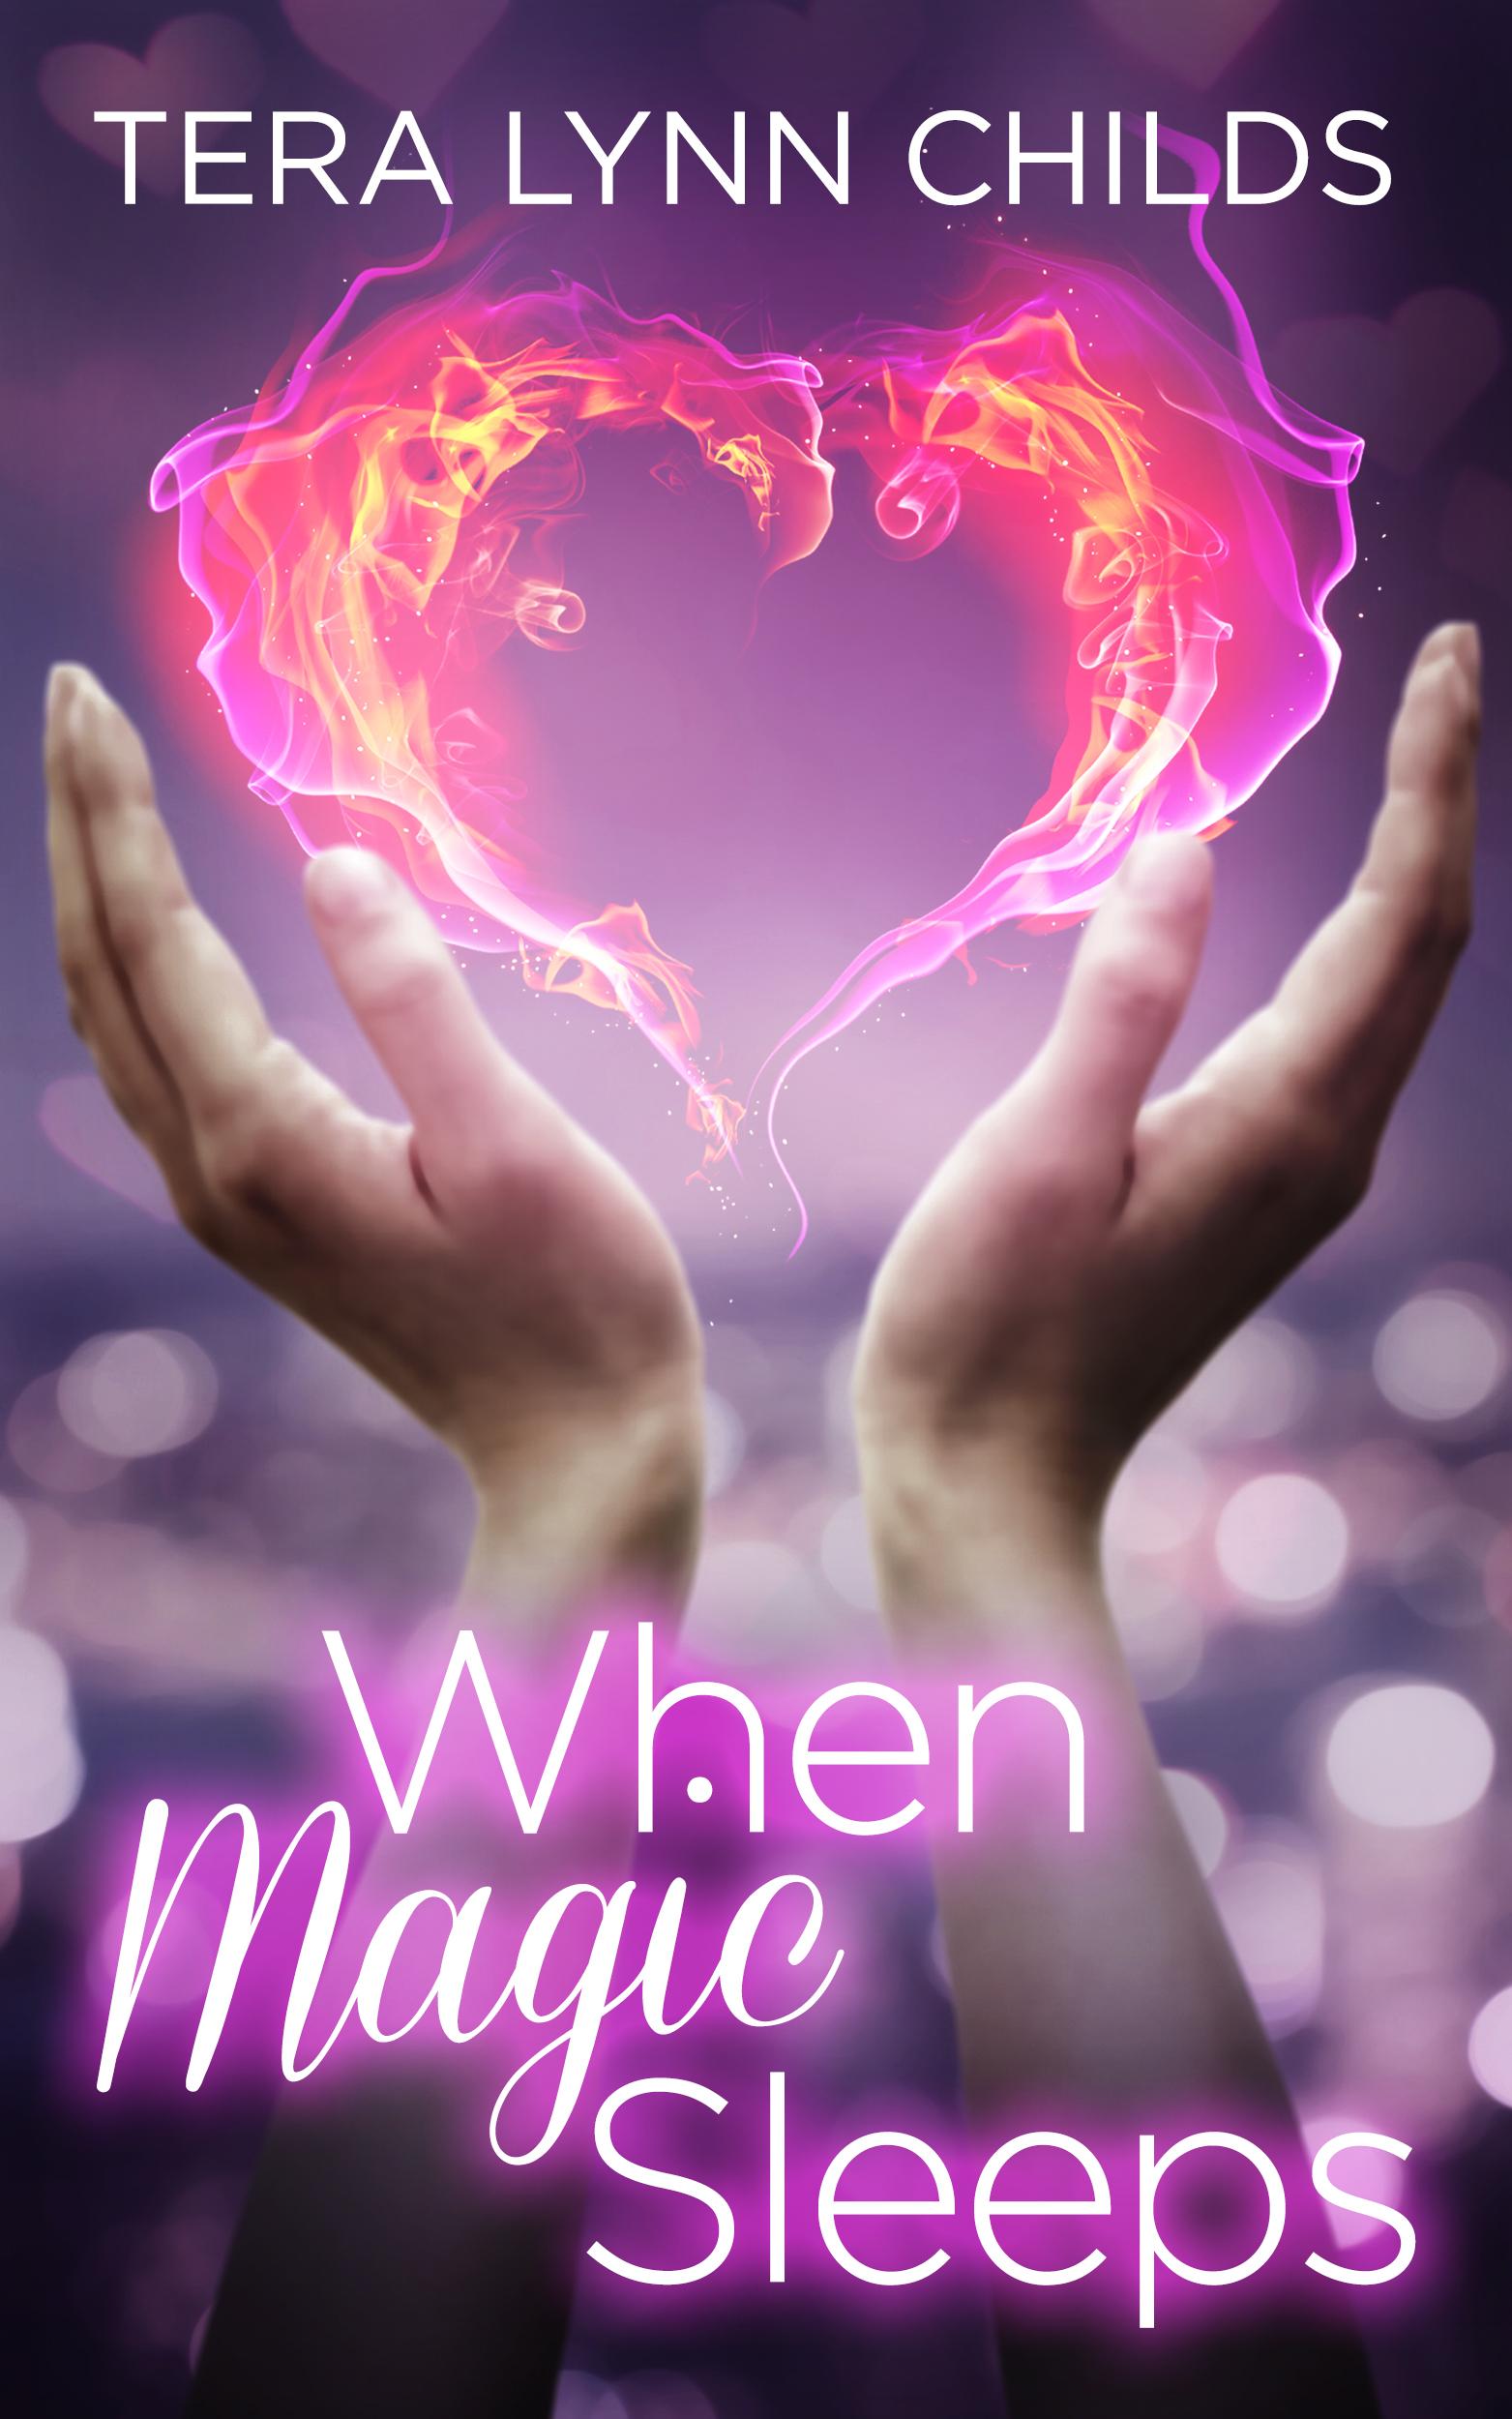 Tera Lynn Childs - When Magic Sleeps